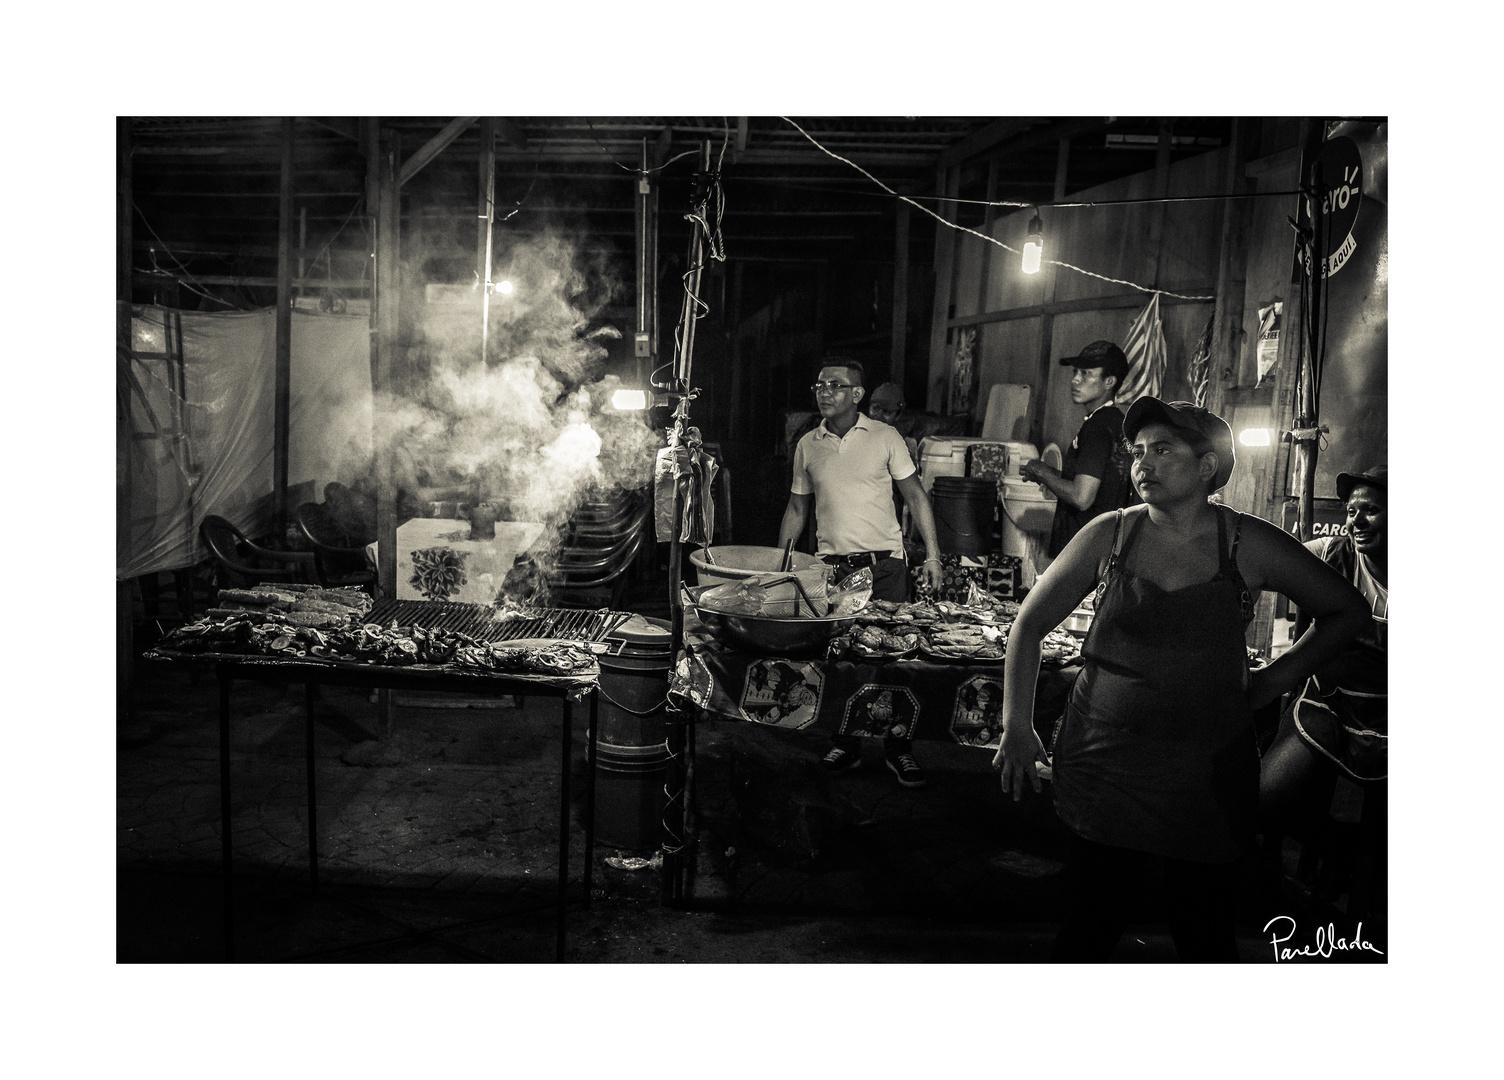 Comedor - Nicaragua (2016)